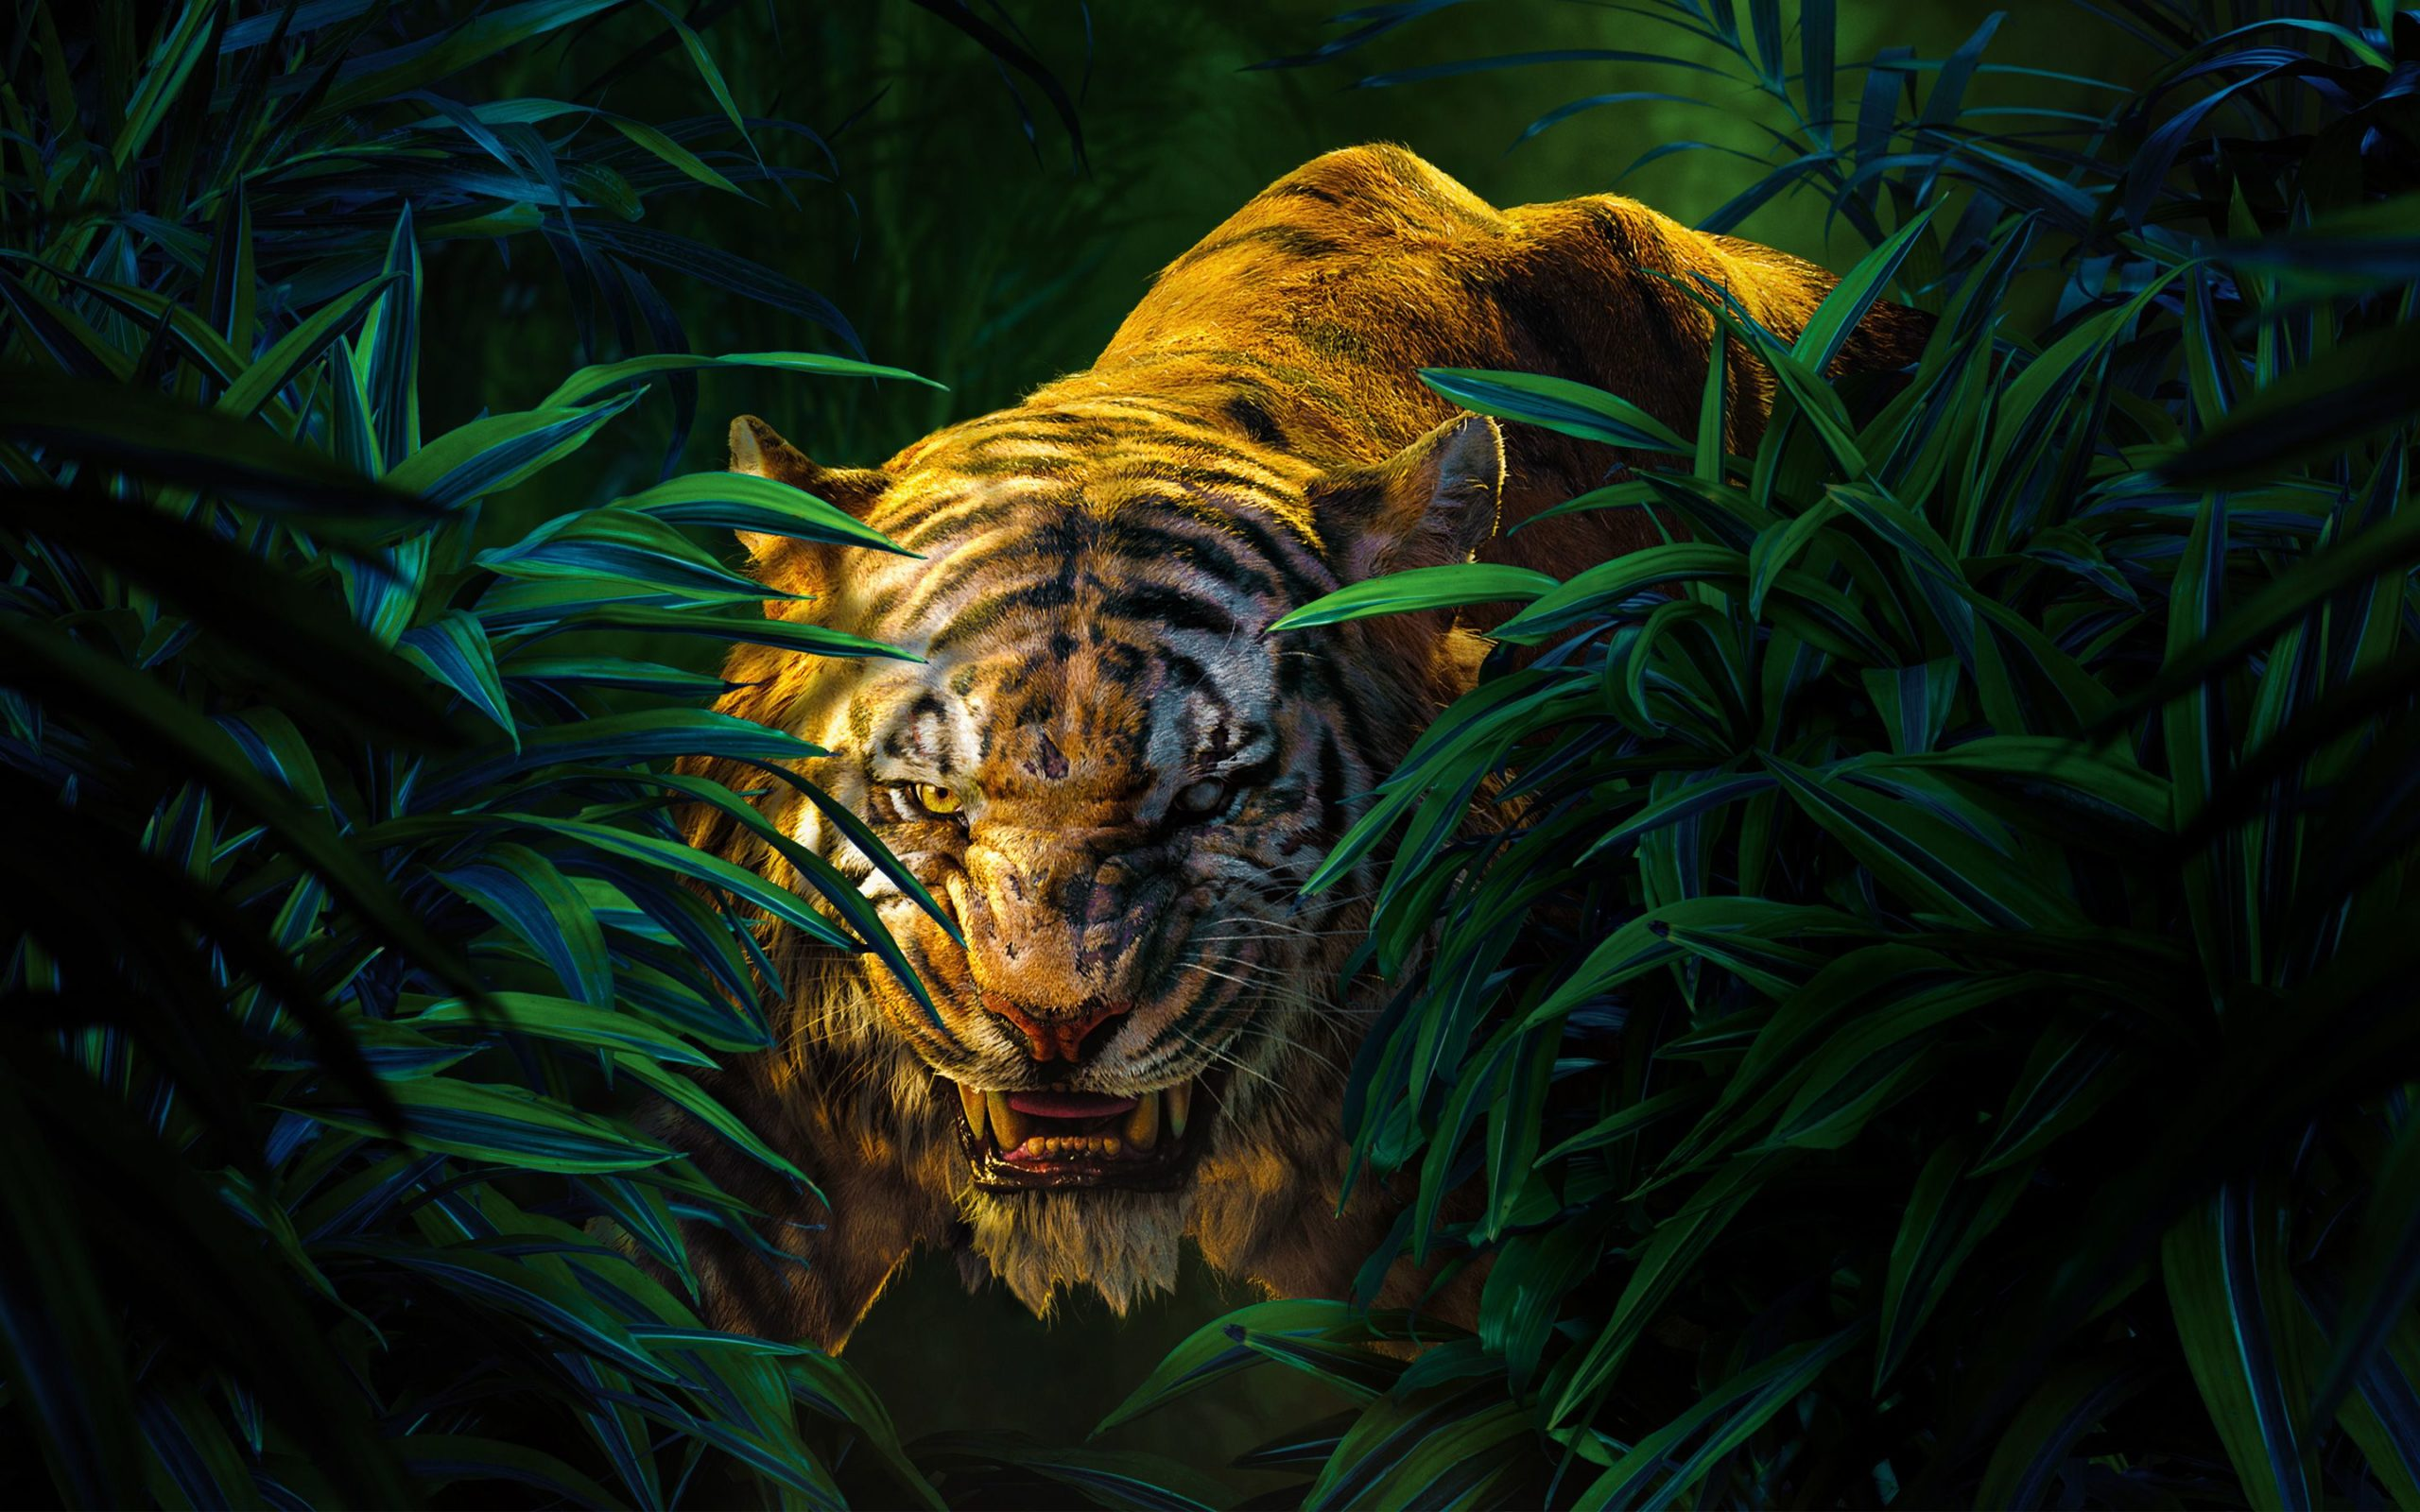 tiger animal images